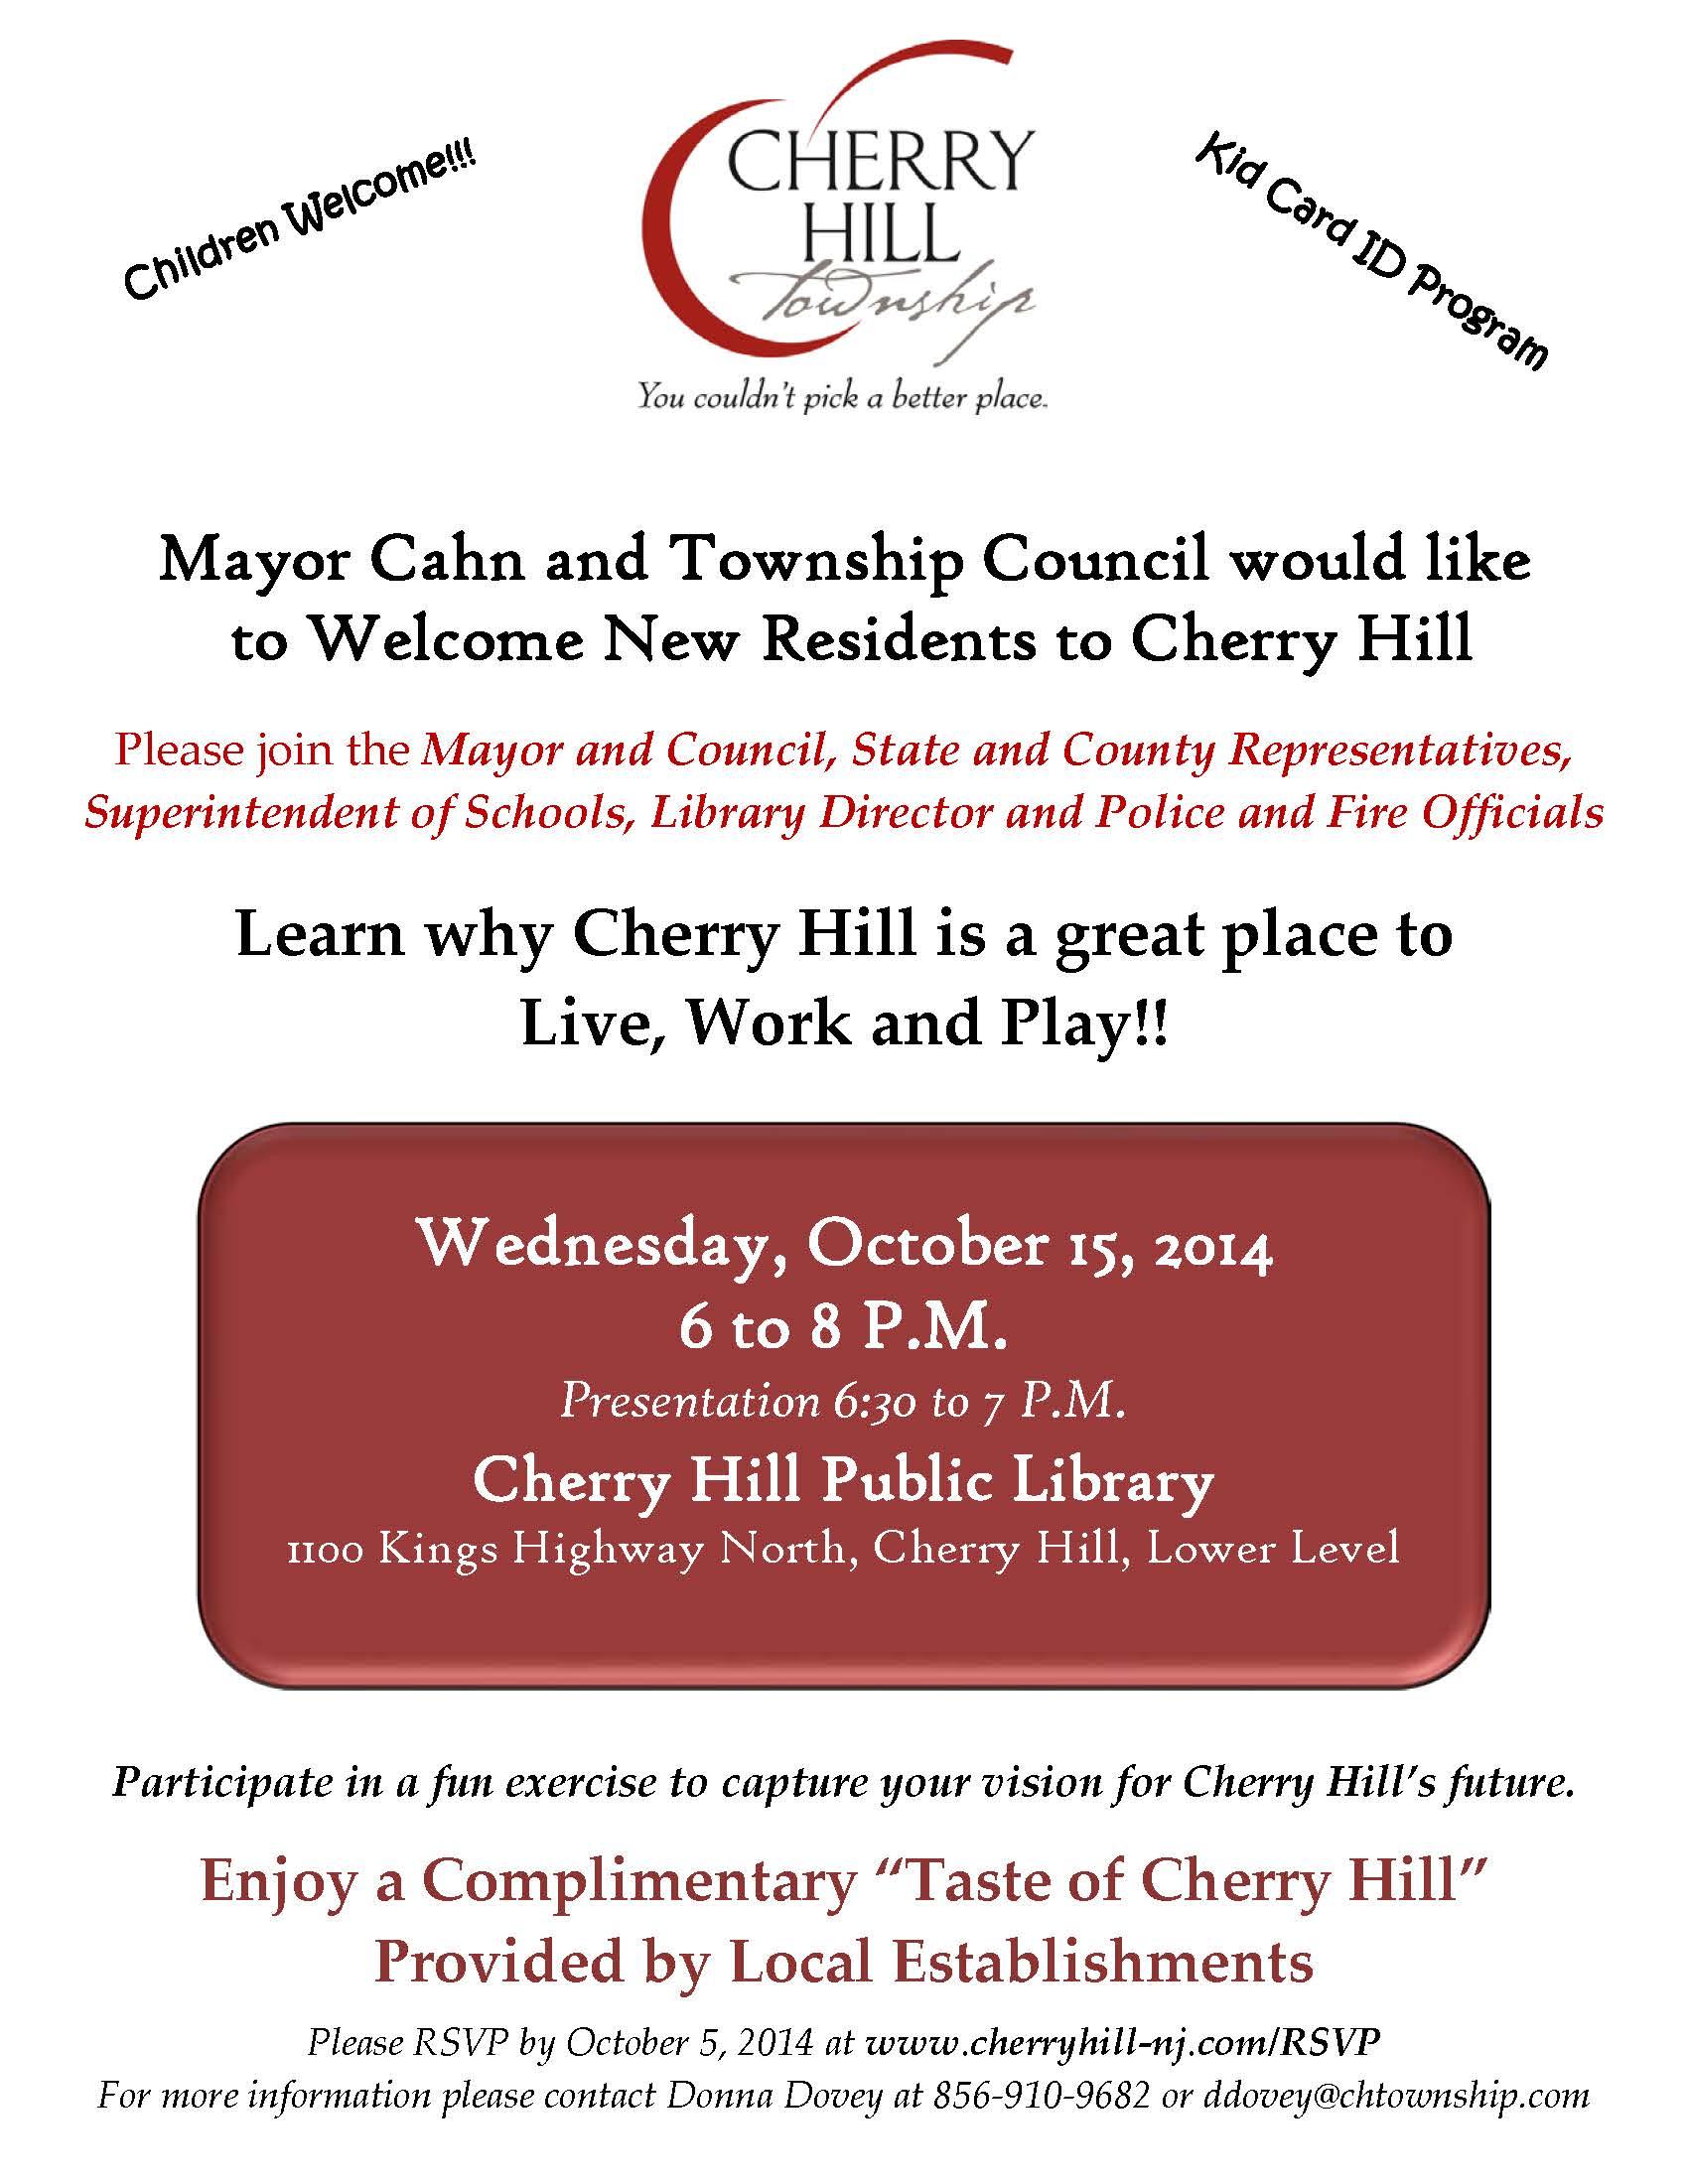 Cherry Hill Township, Nj For Cherry Hill Public Schools Calendar